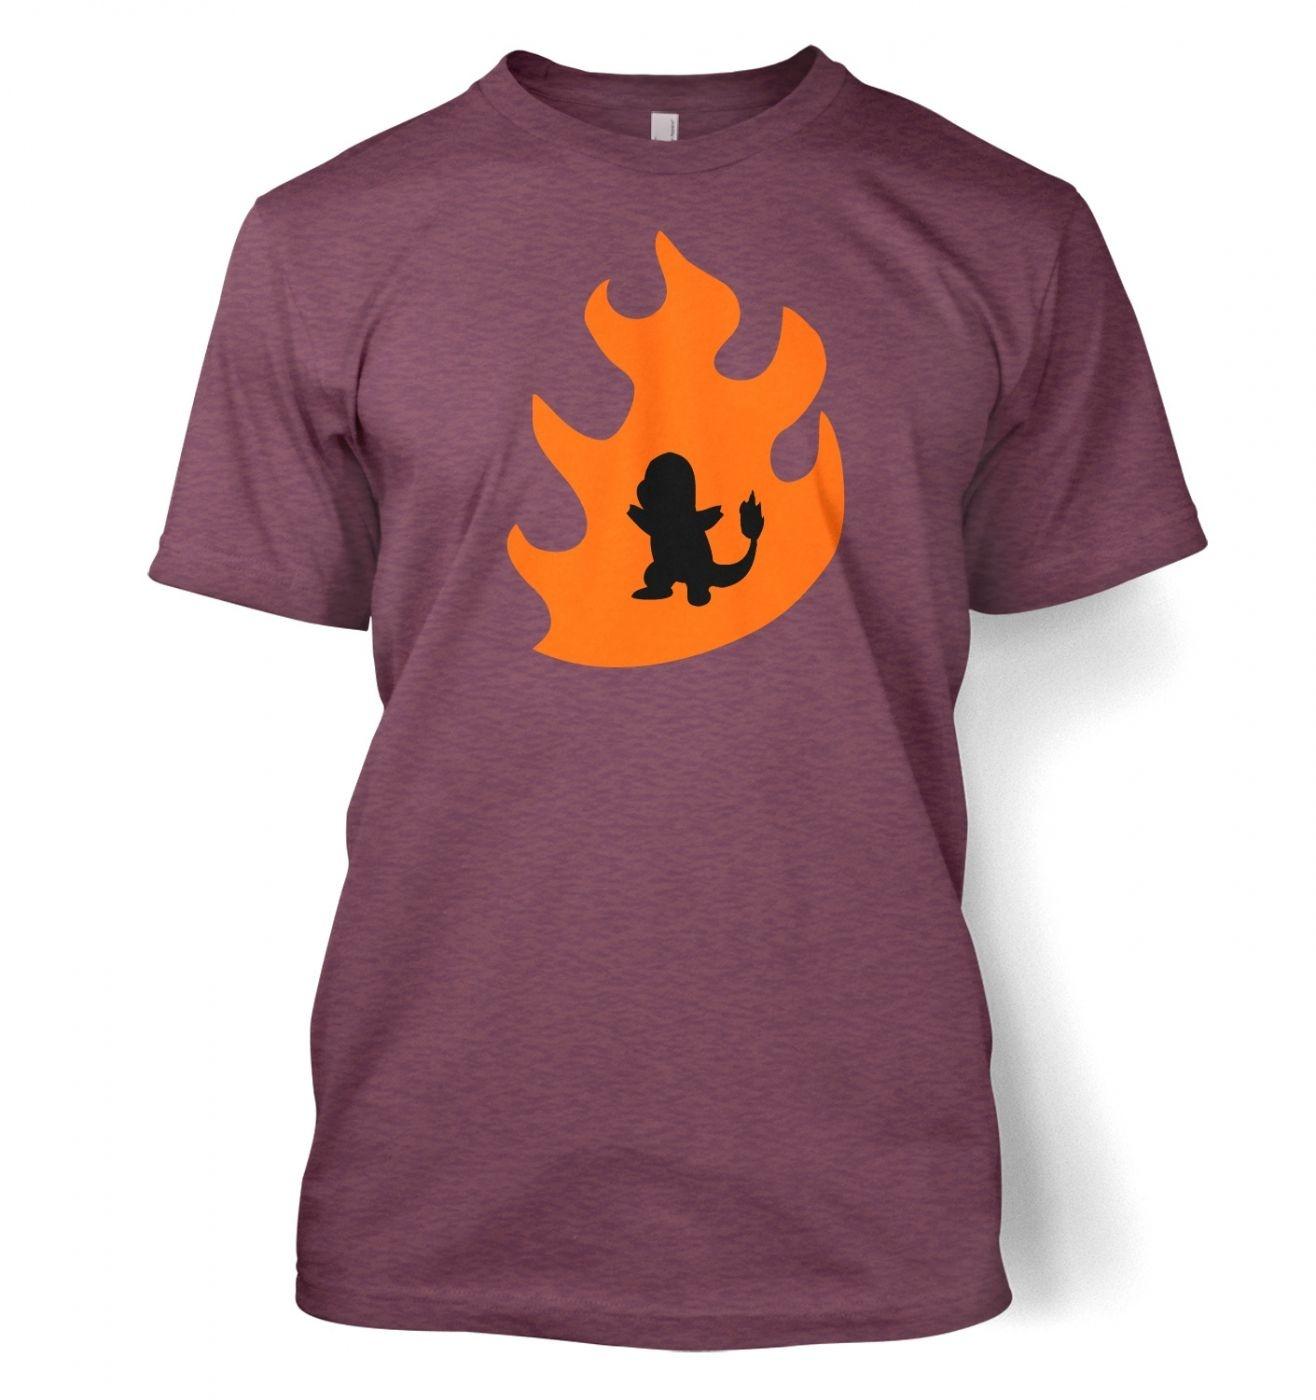 Orange Charmander Silhouette T-Shirt - Inspired by Pokemon